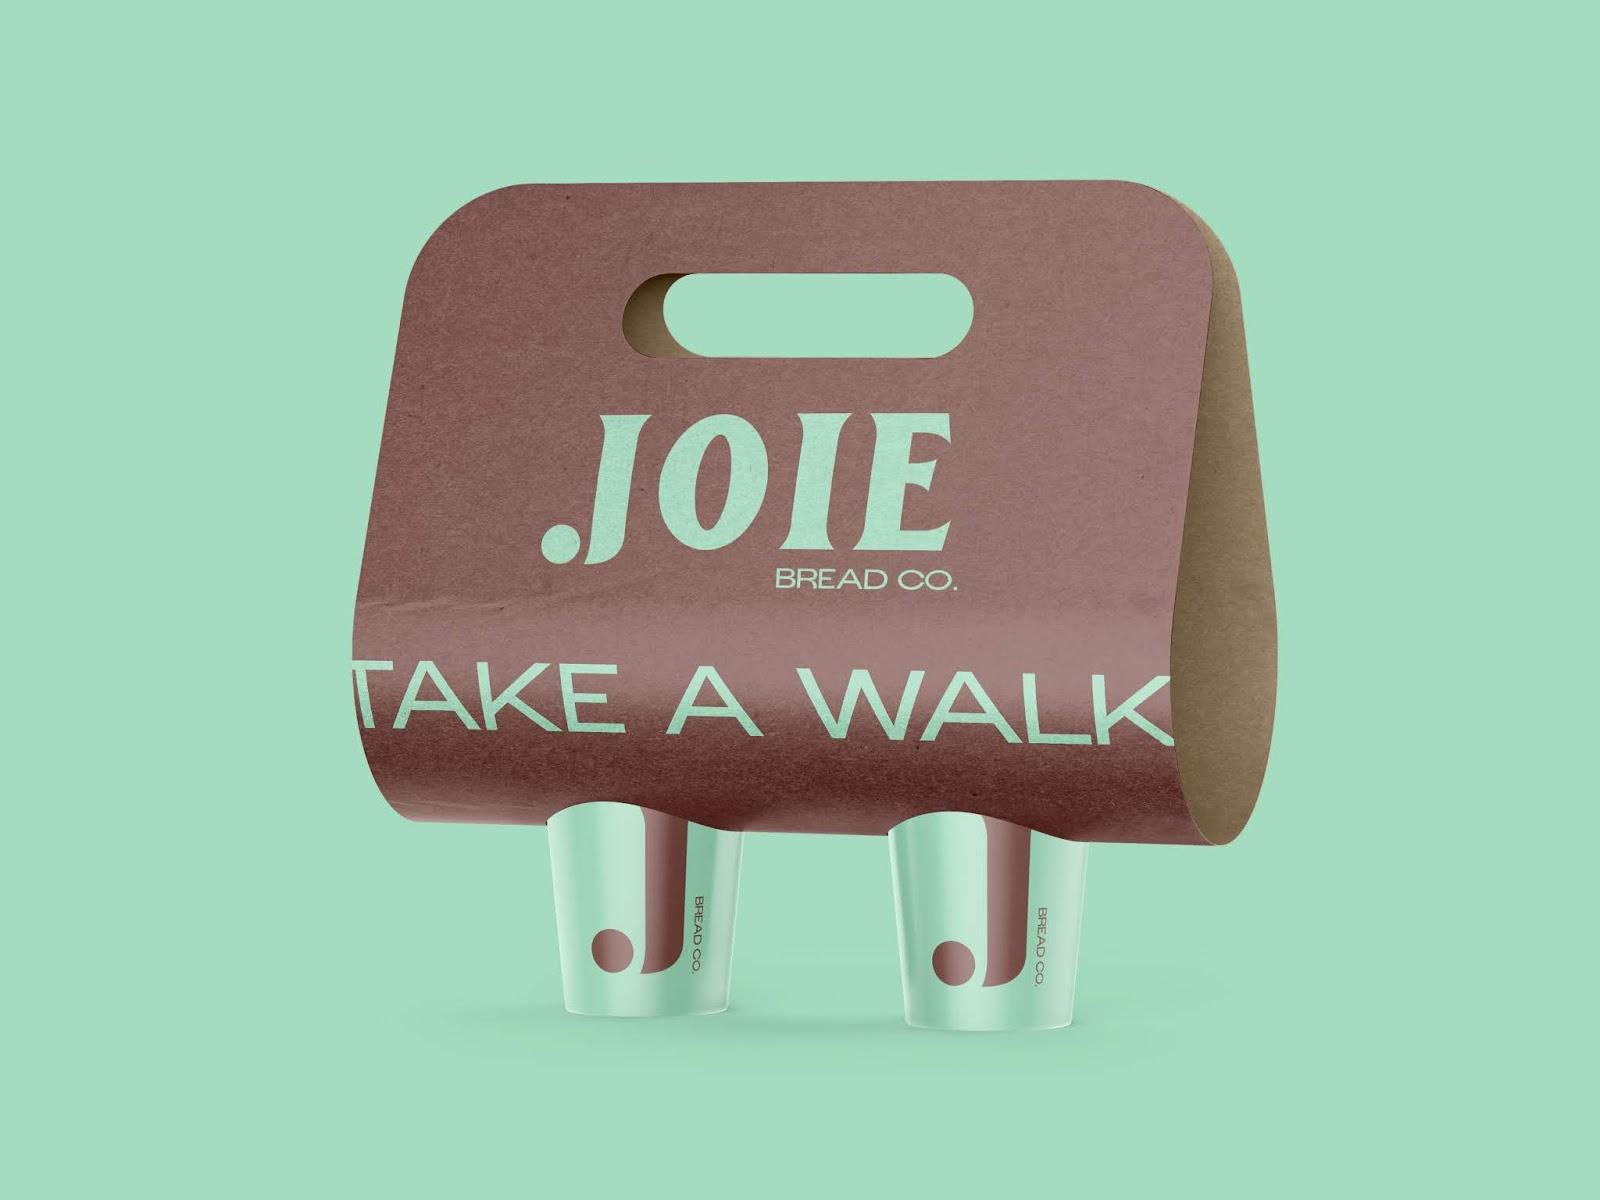 Joie-咖啡手提杯套